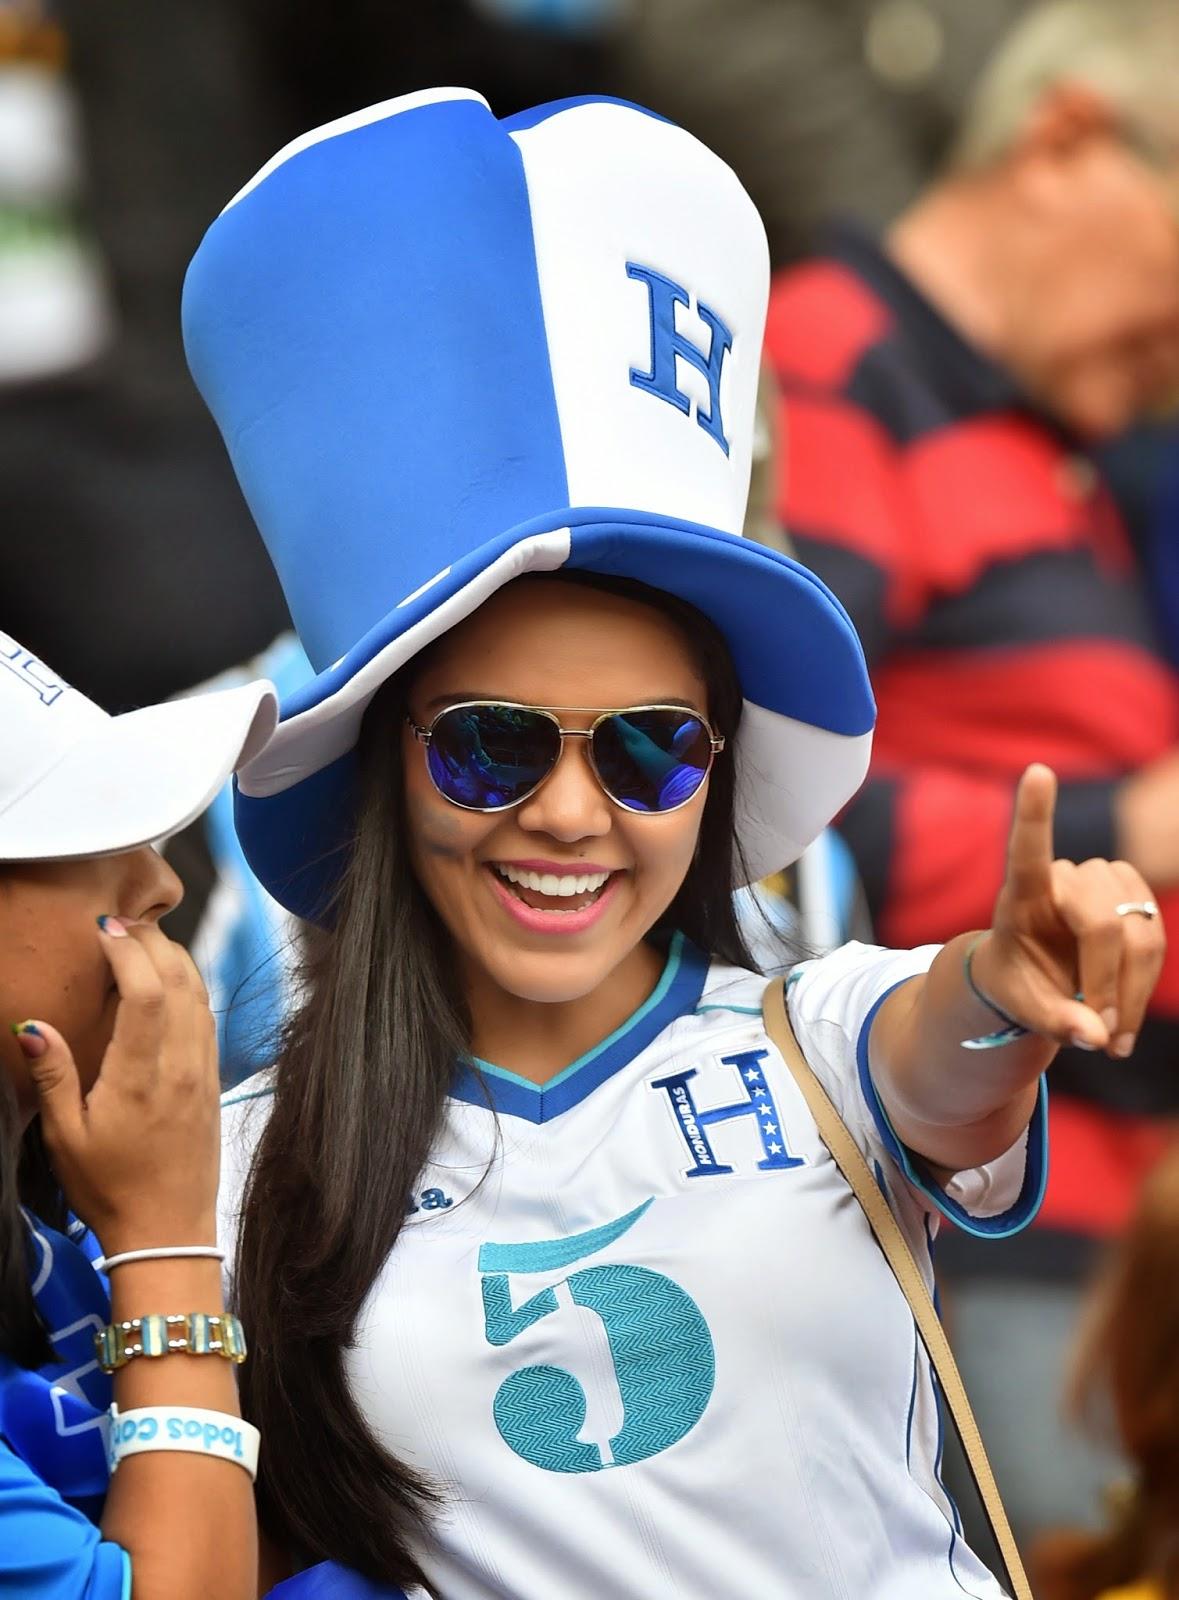 FIFA World Cup, FIFA World Cup 2014, France vs Honduras, Karim Benzema, France Squad, Honduras Squad, Group E, Sports, Football, Brazil, Osman Chavez, Roger Espinoza, Mamadou Sakho,  Paul Pogba, Olivier Giroud,